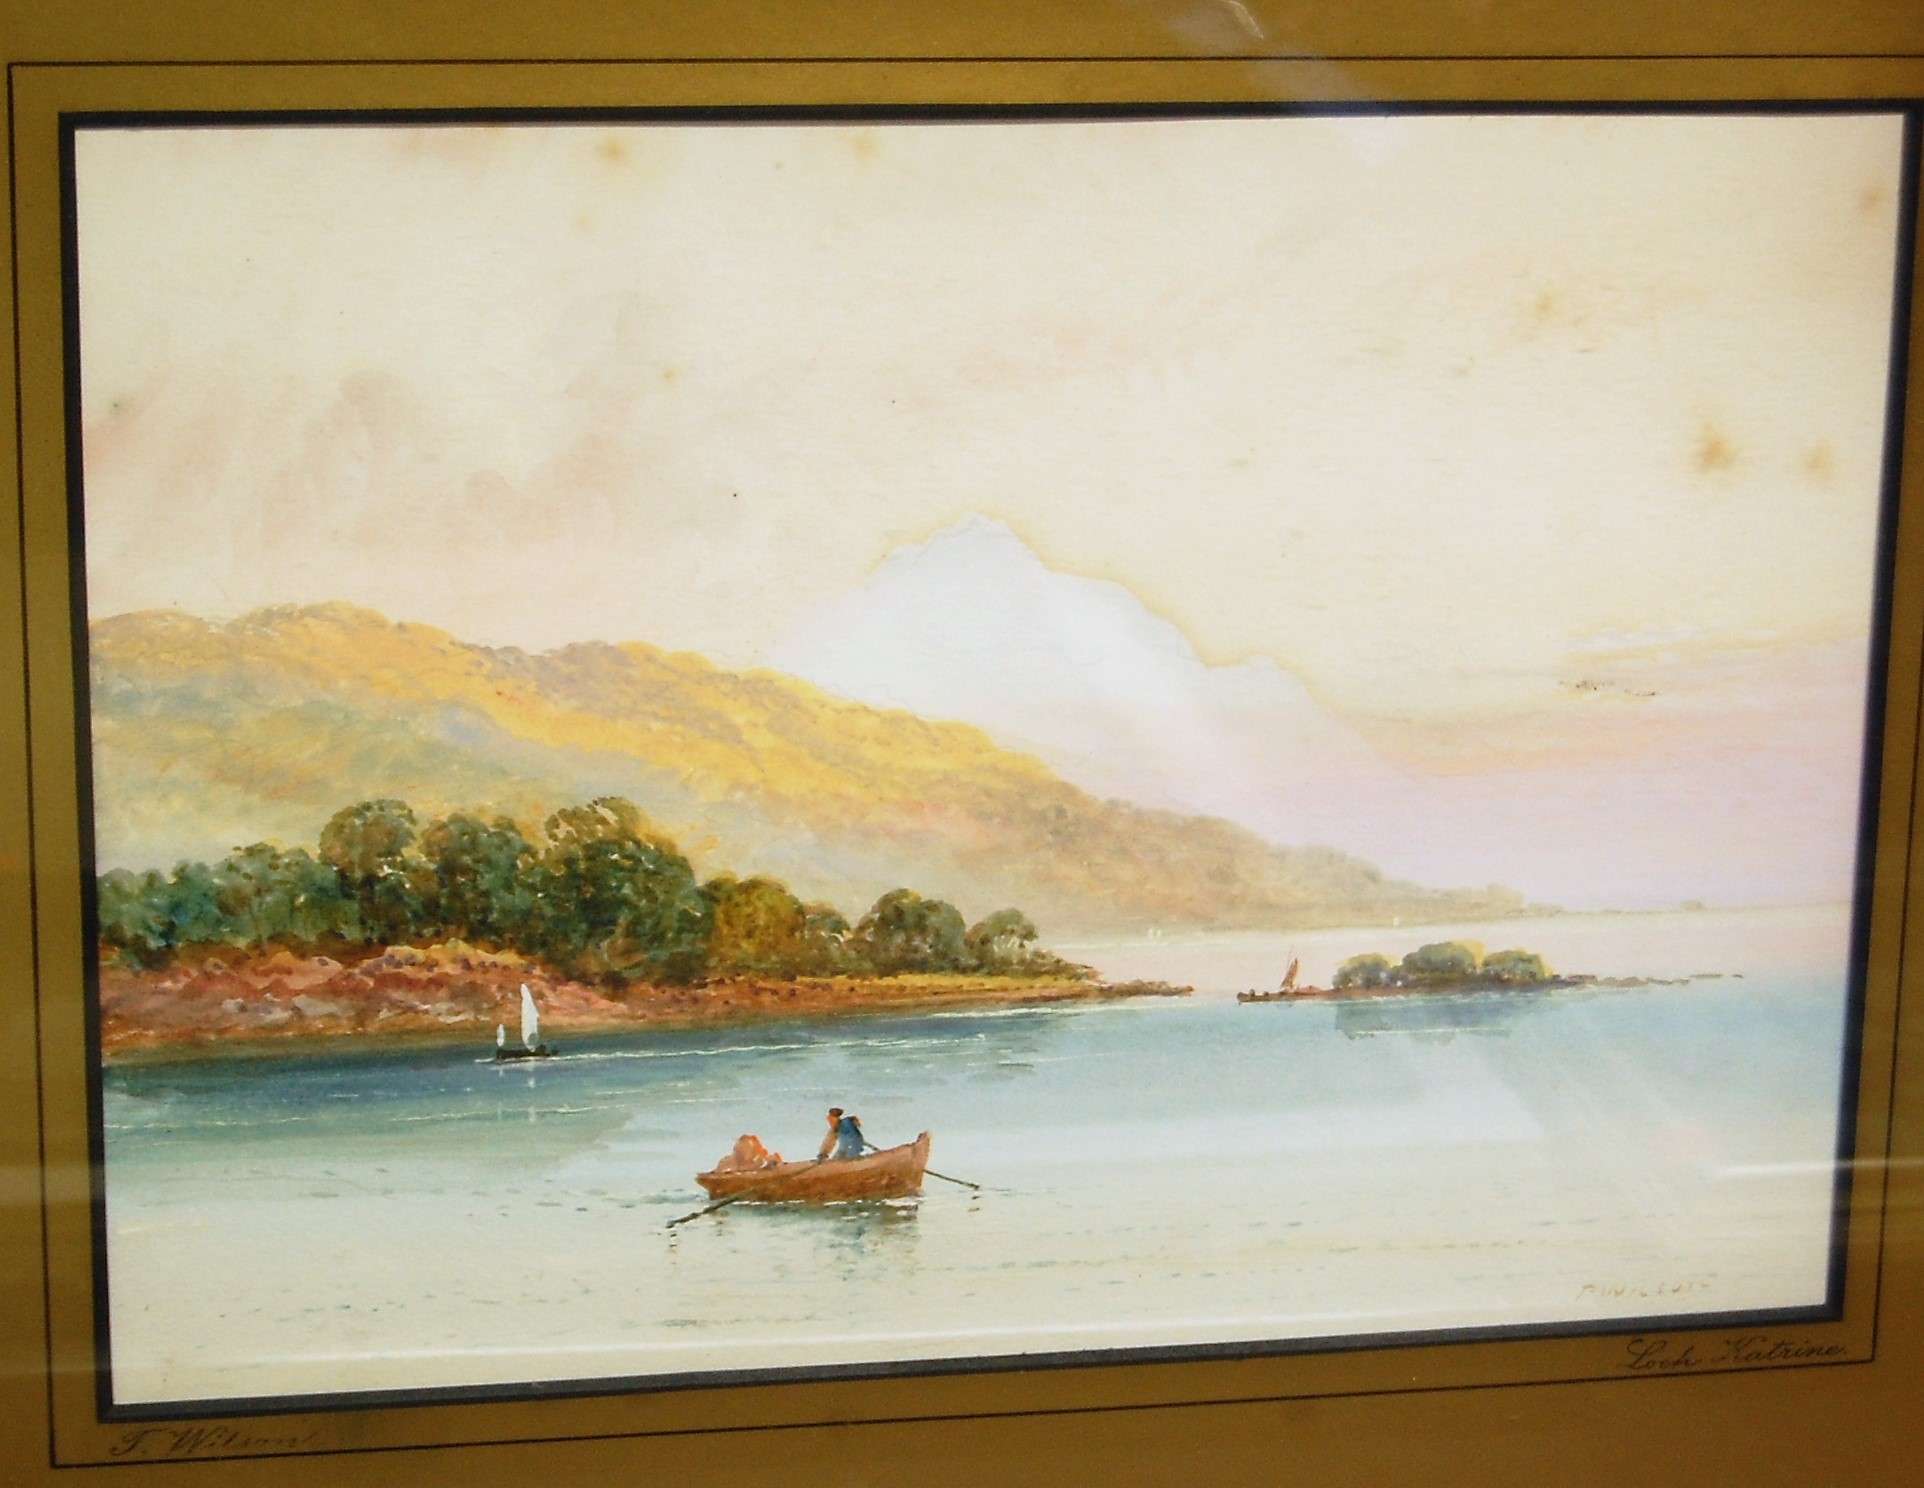 Lot 1039 - T. Wilson - Pair; Loch Katrine and Loch Long, watercolours, each 24 x 35cm